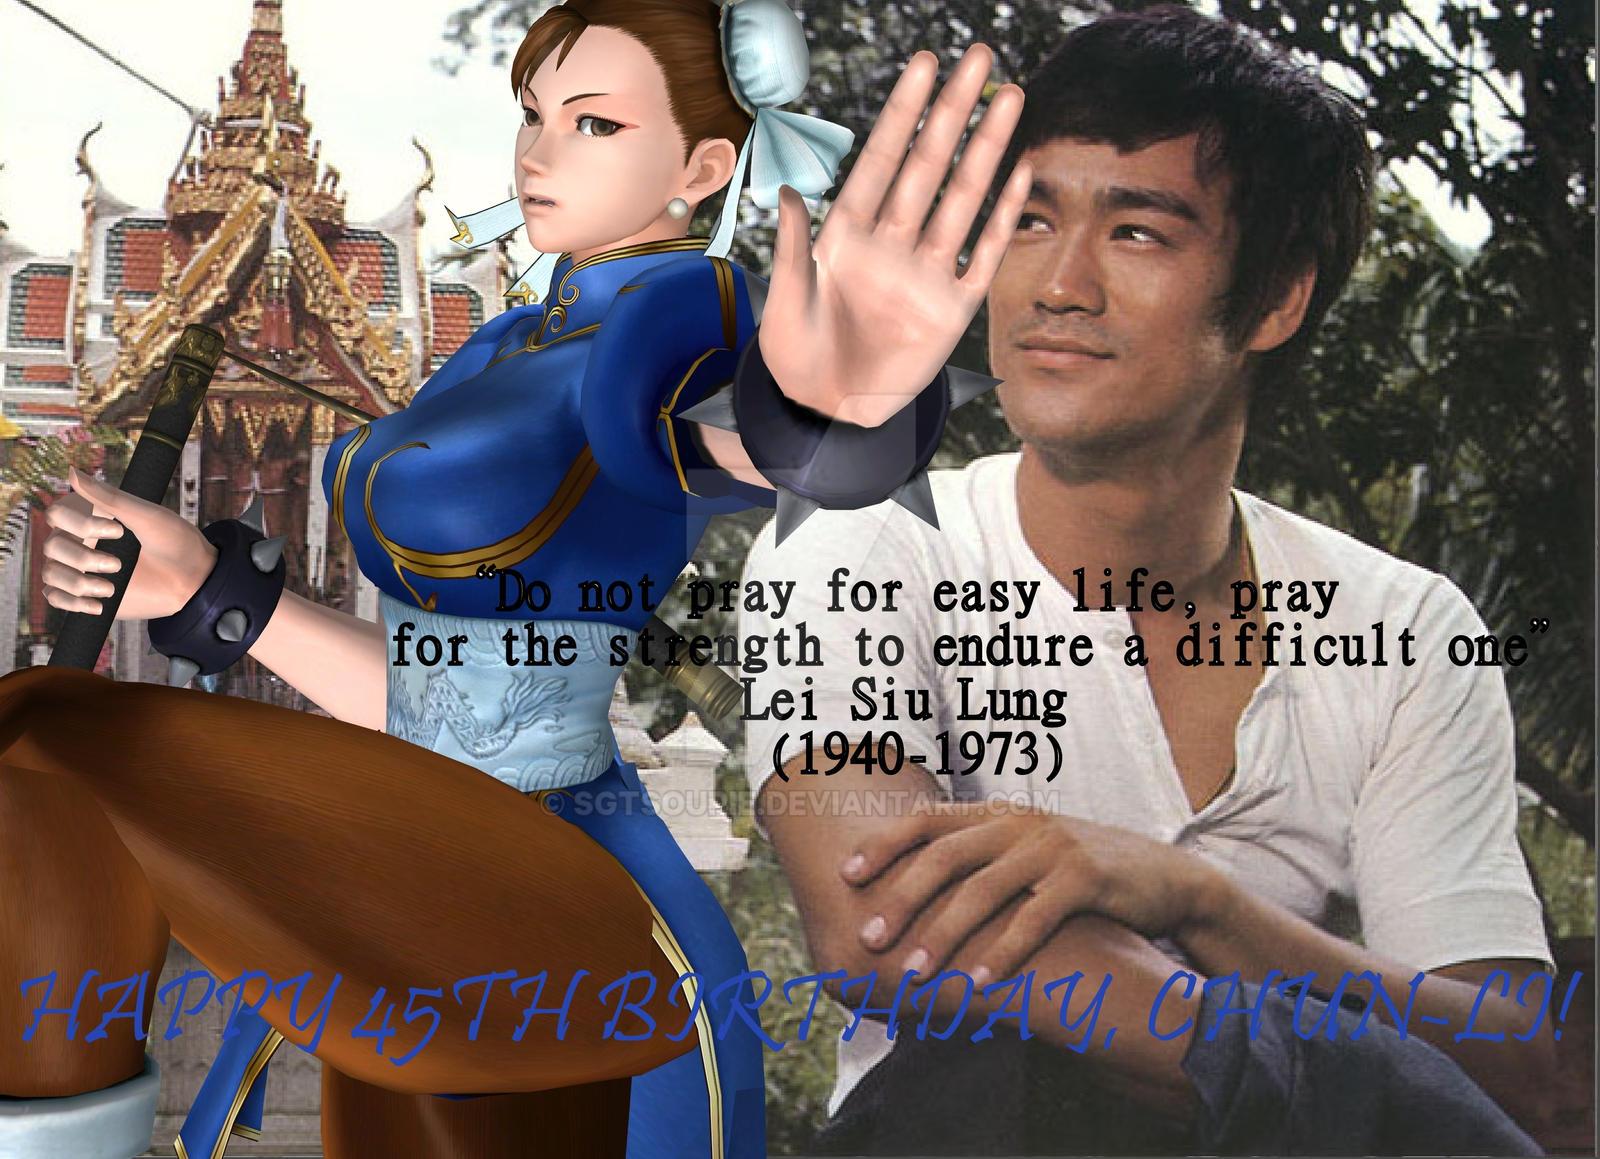 Happy birthday, Chun-Li! by Sgtsoupie